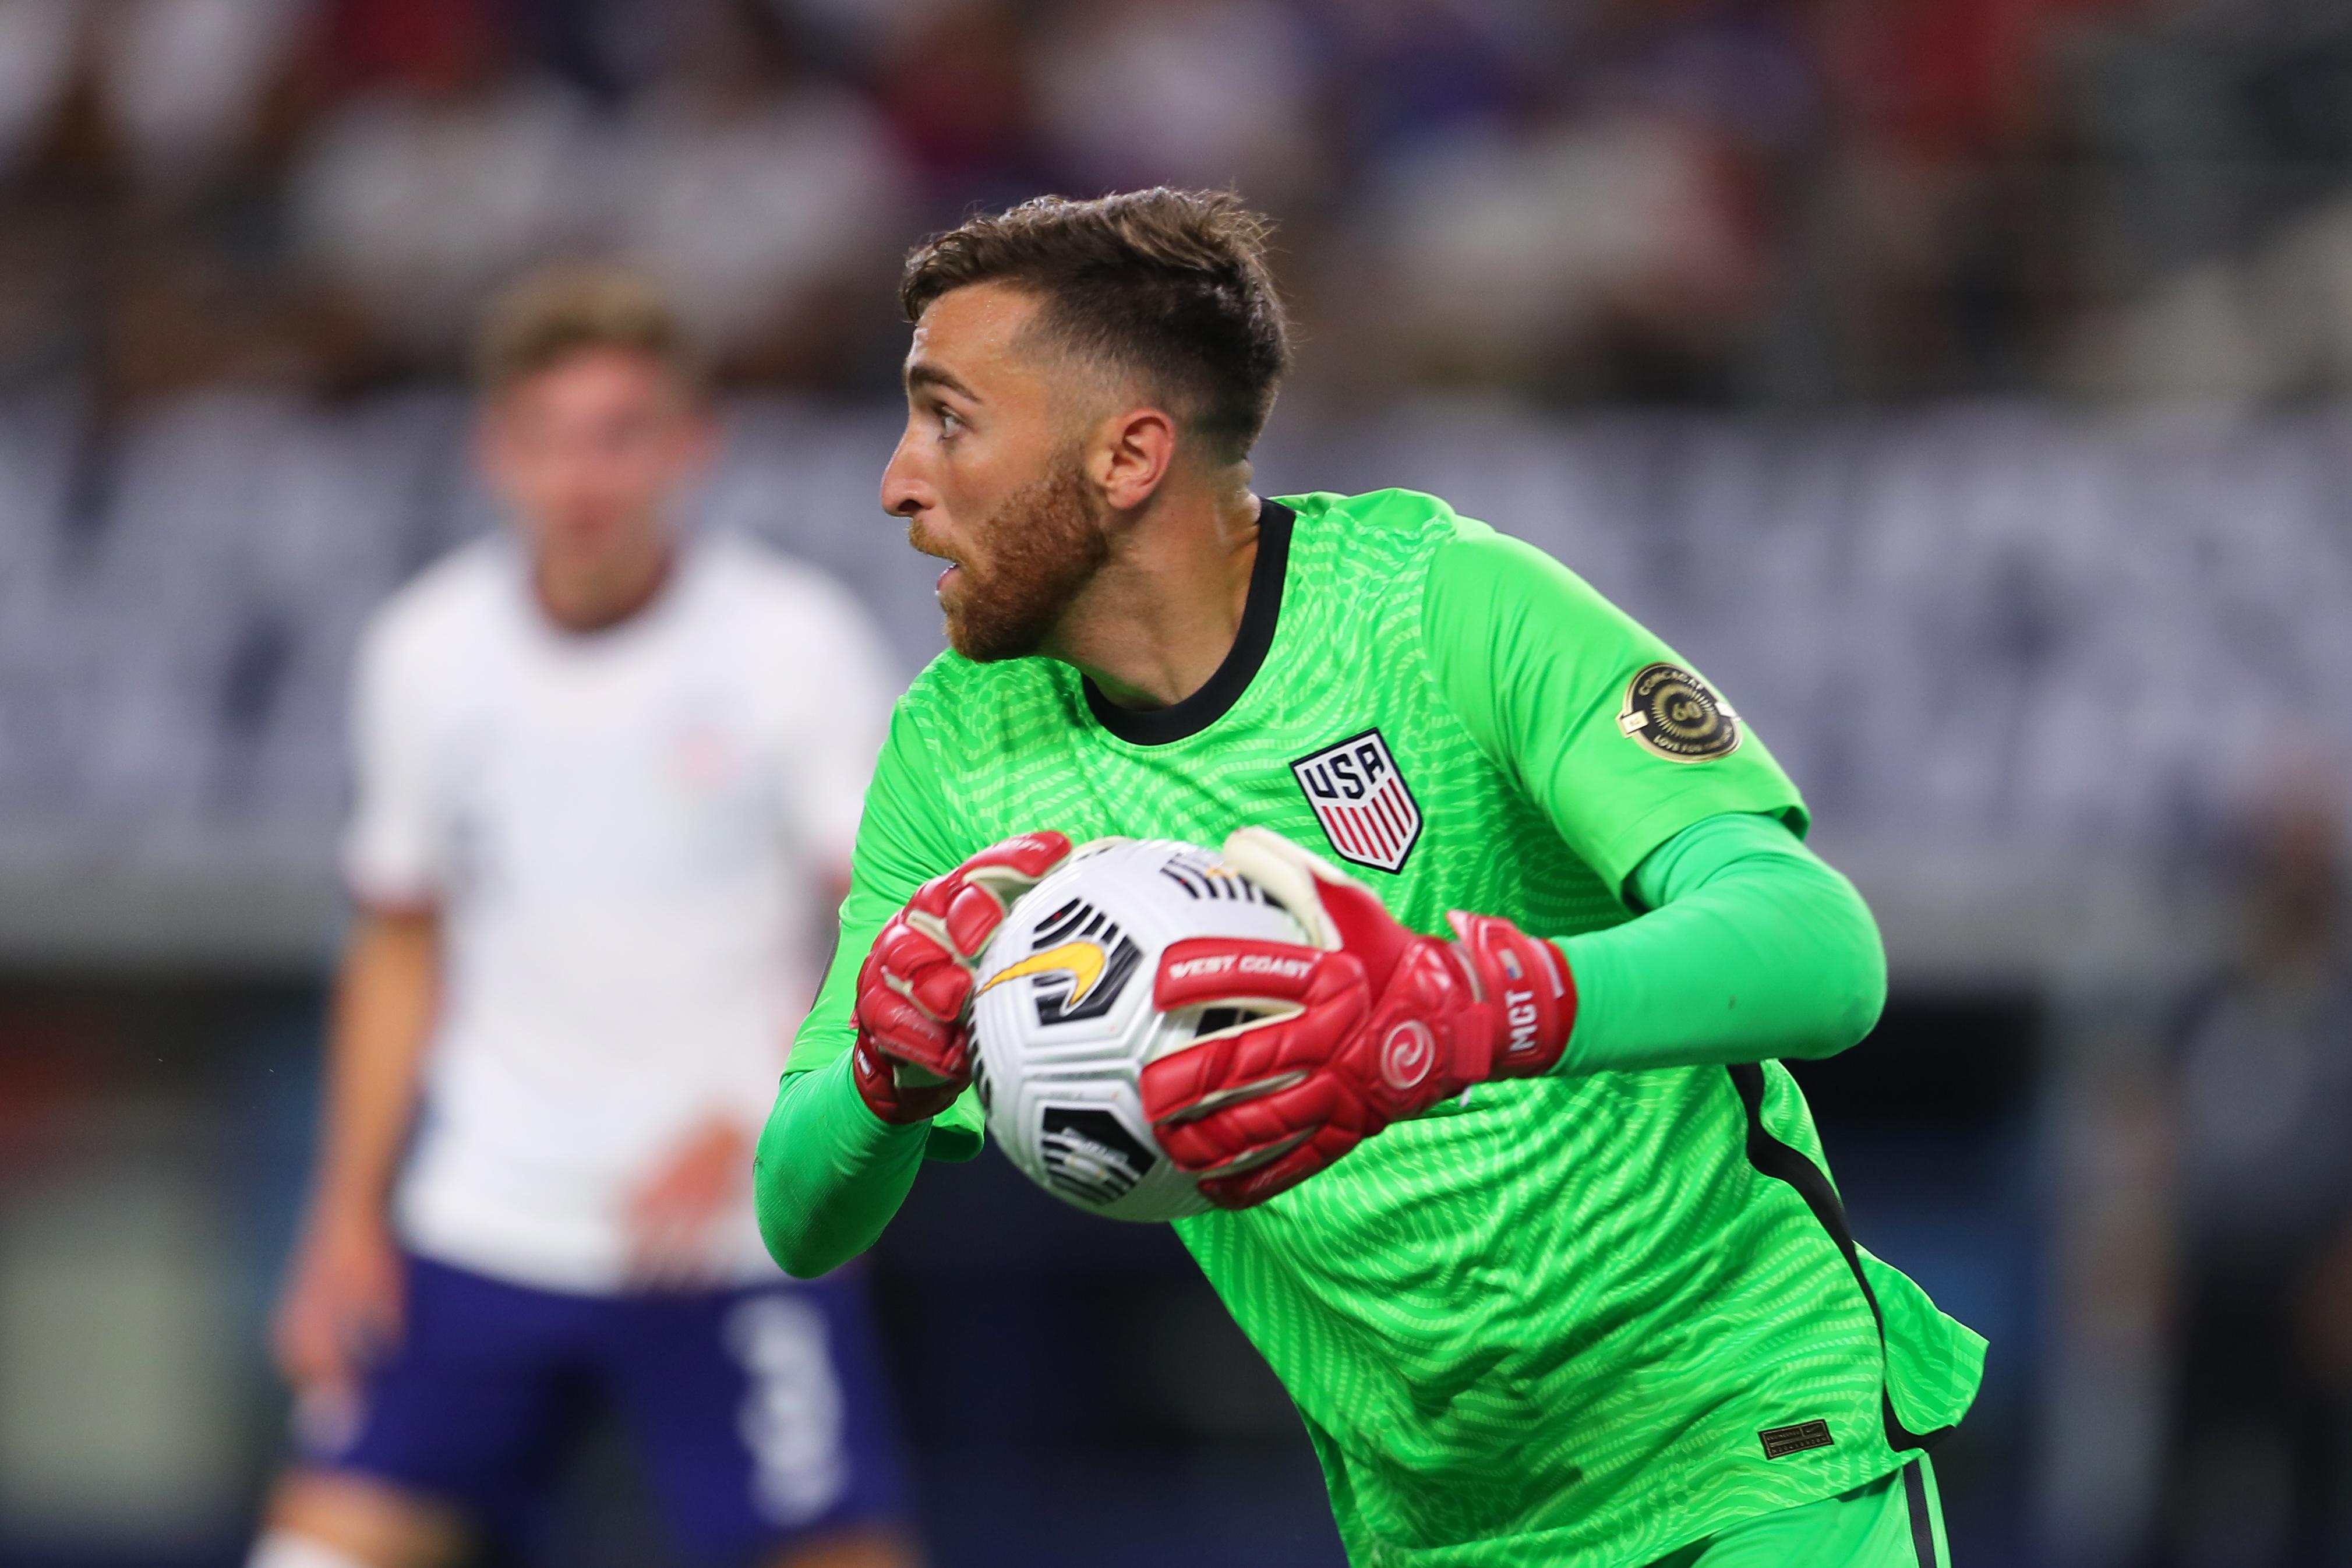 United States v Jamaica: Quarterfinals - 2021 CONCACAF Gold Cup